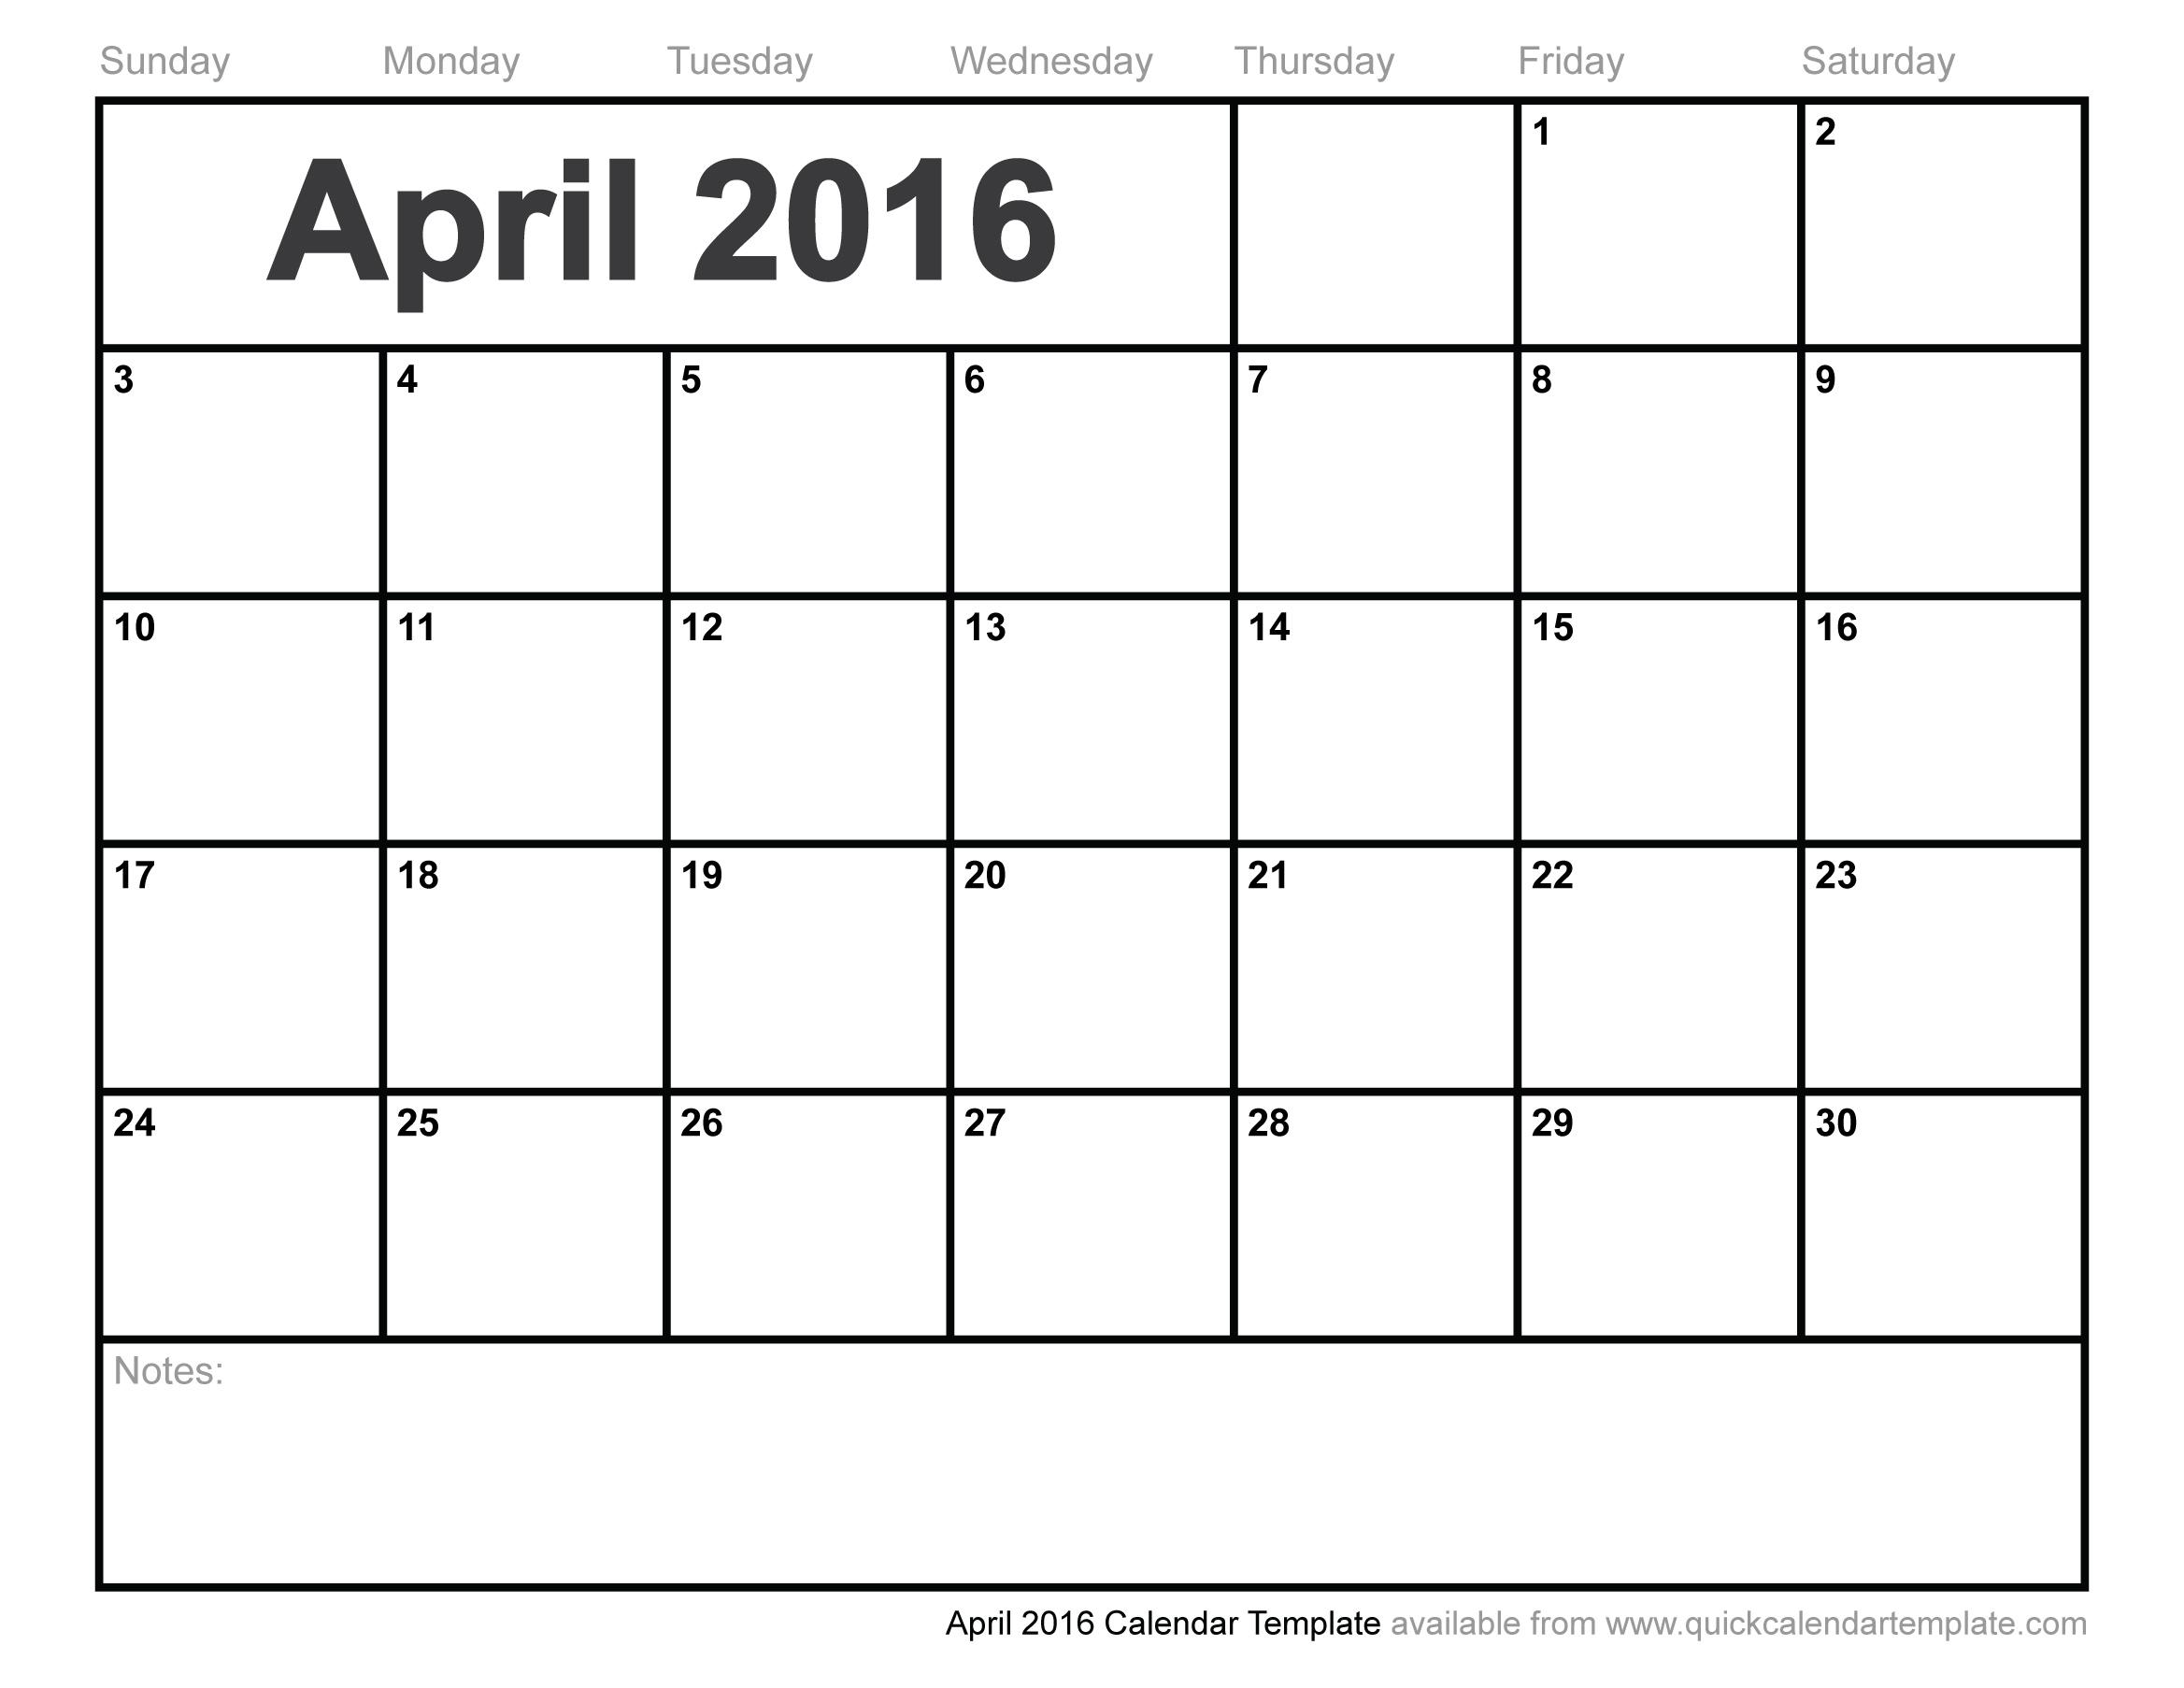 Weekly calendar 2016 uk free printable templates for word calendar.